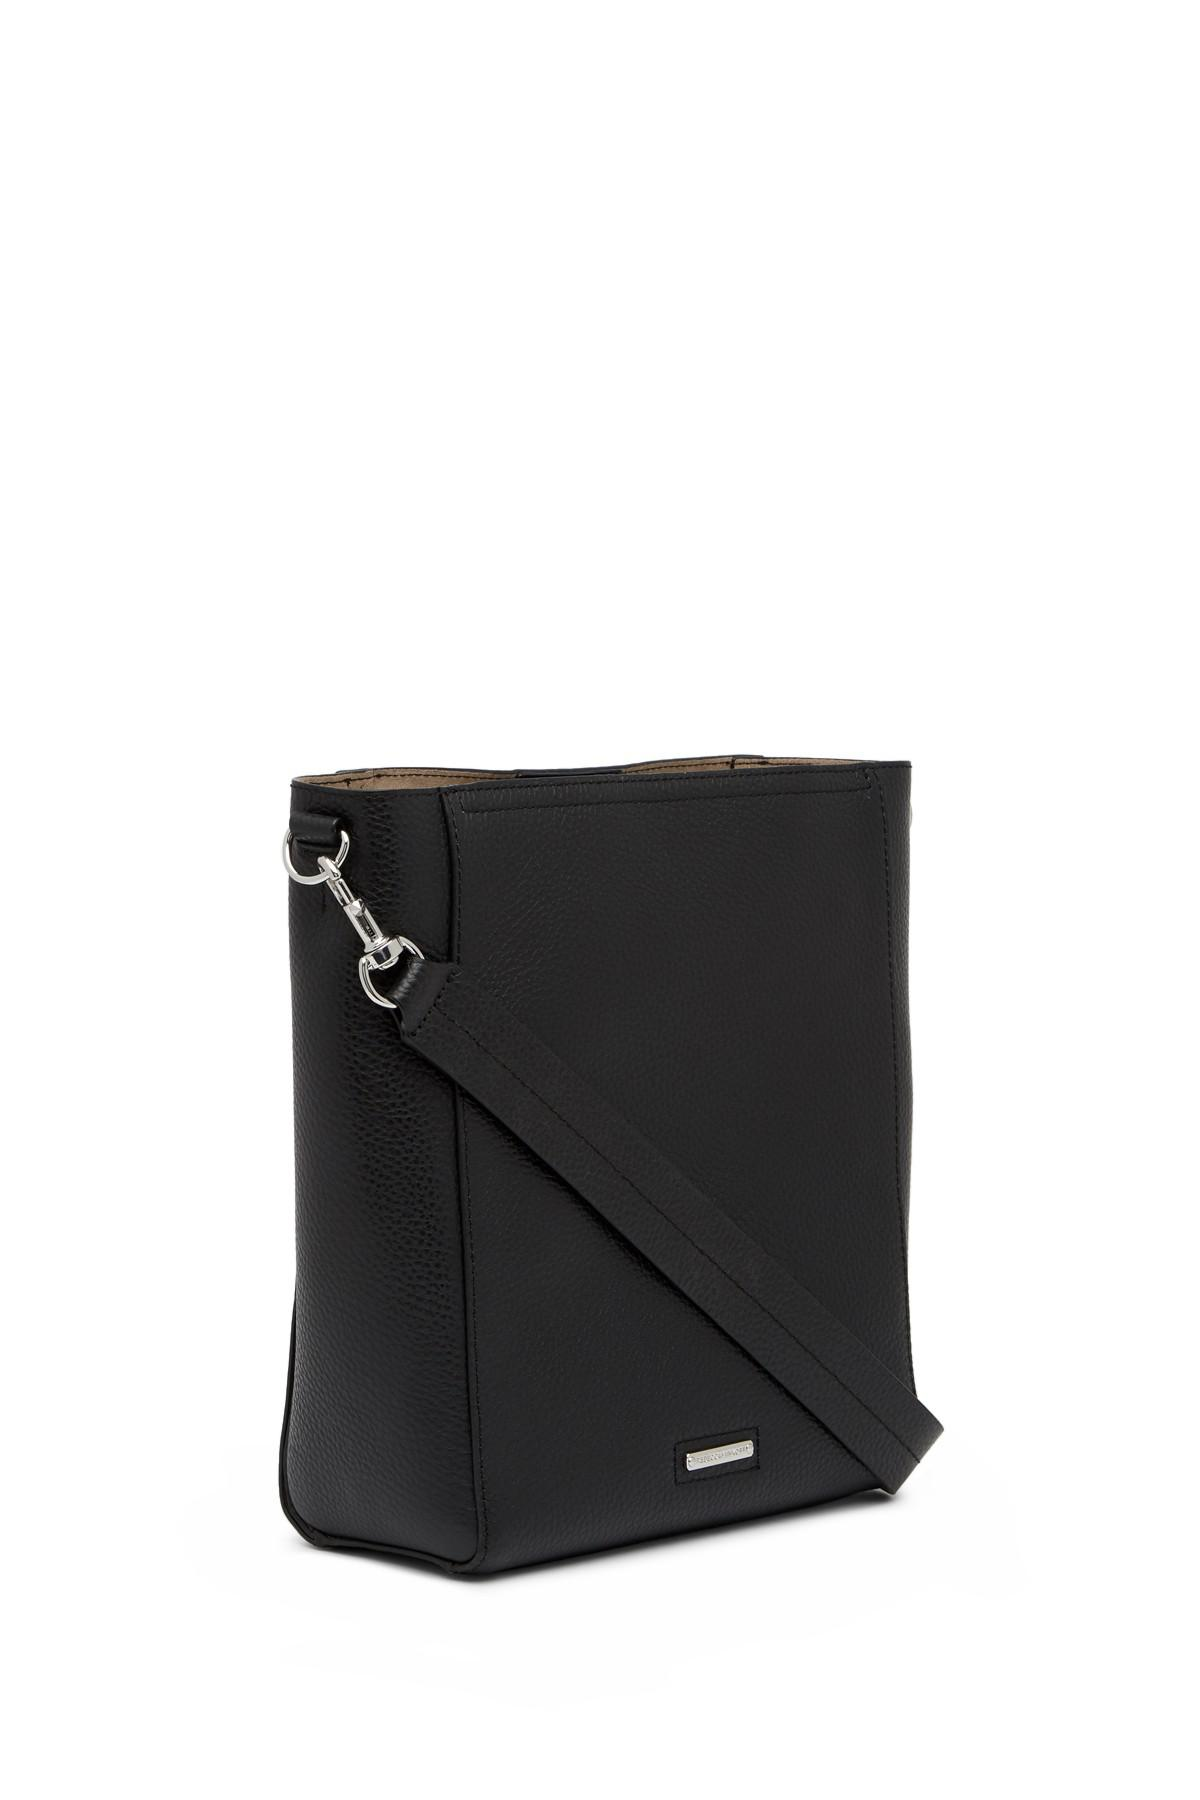 5b1a6c5669d5 Rebecca Minkoff Black Madison Large Leather Hobo Bag